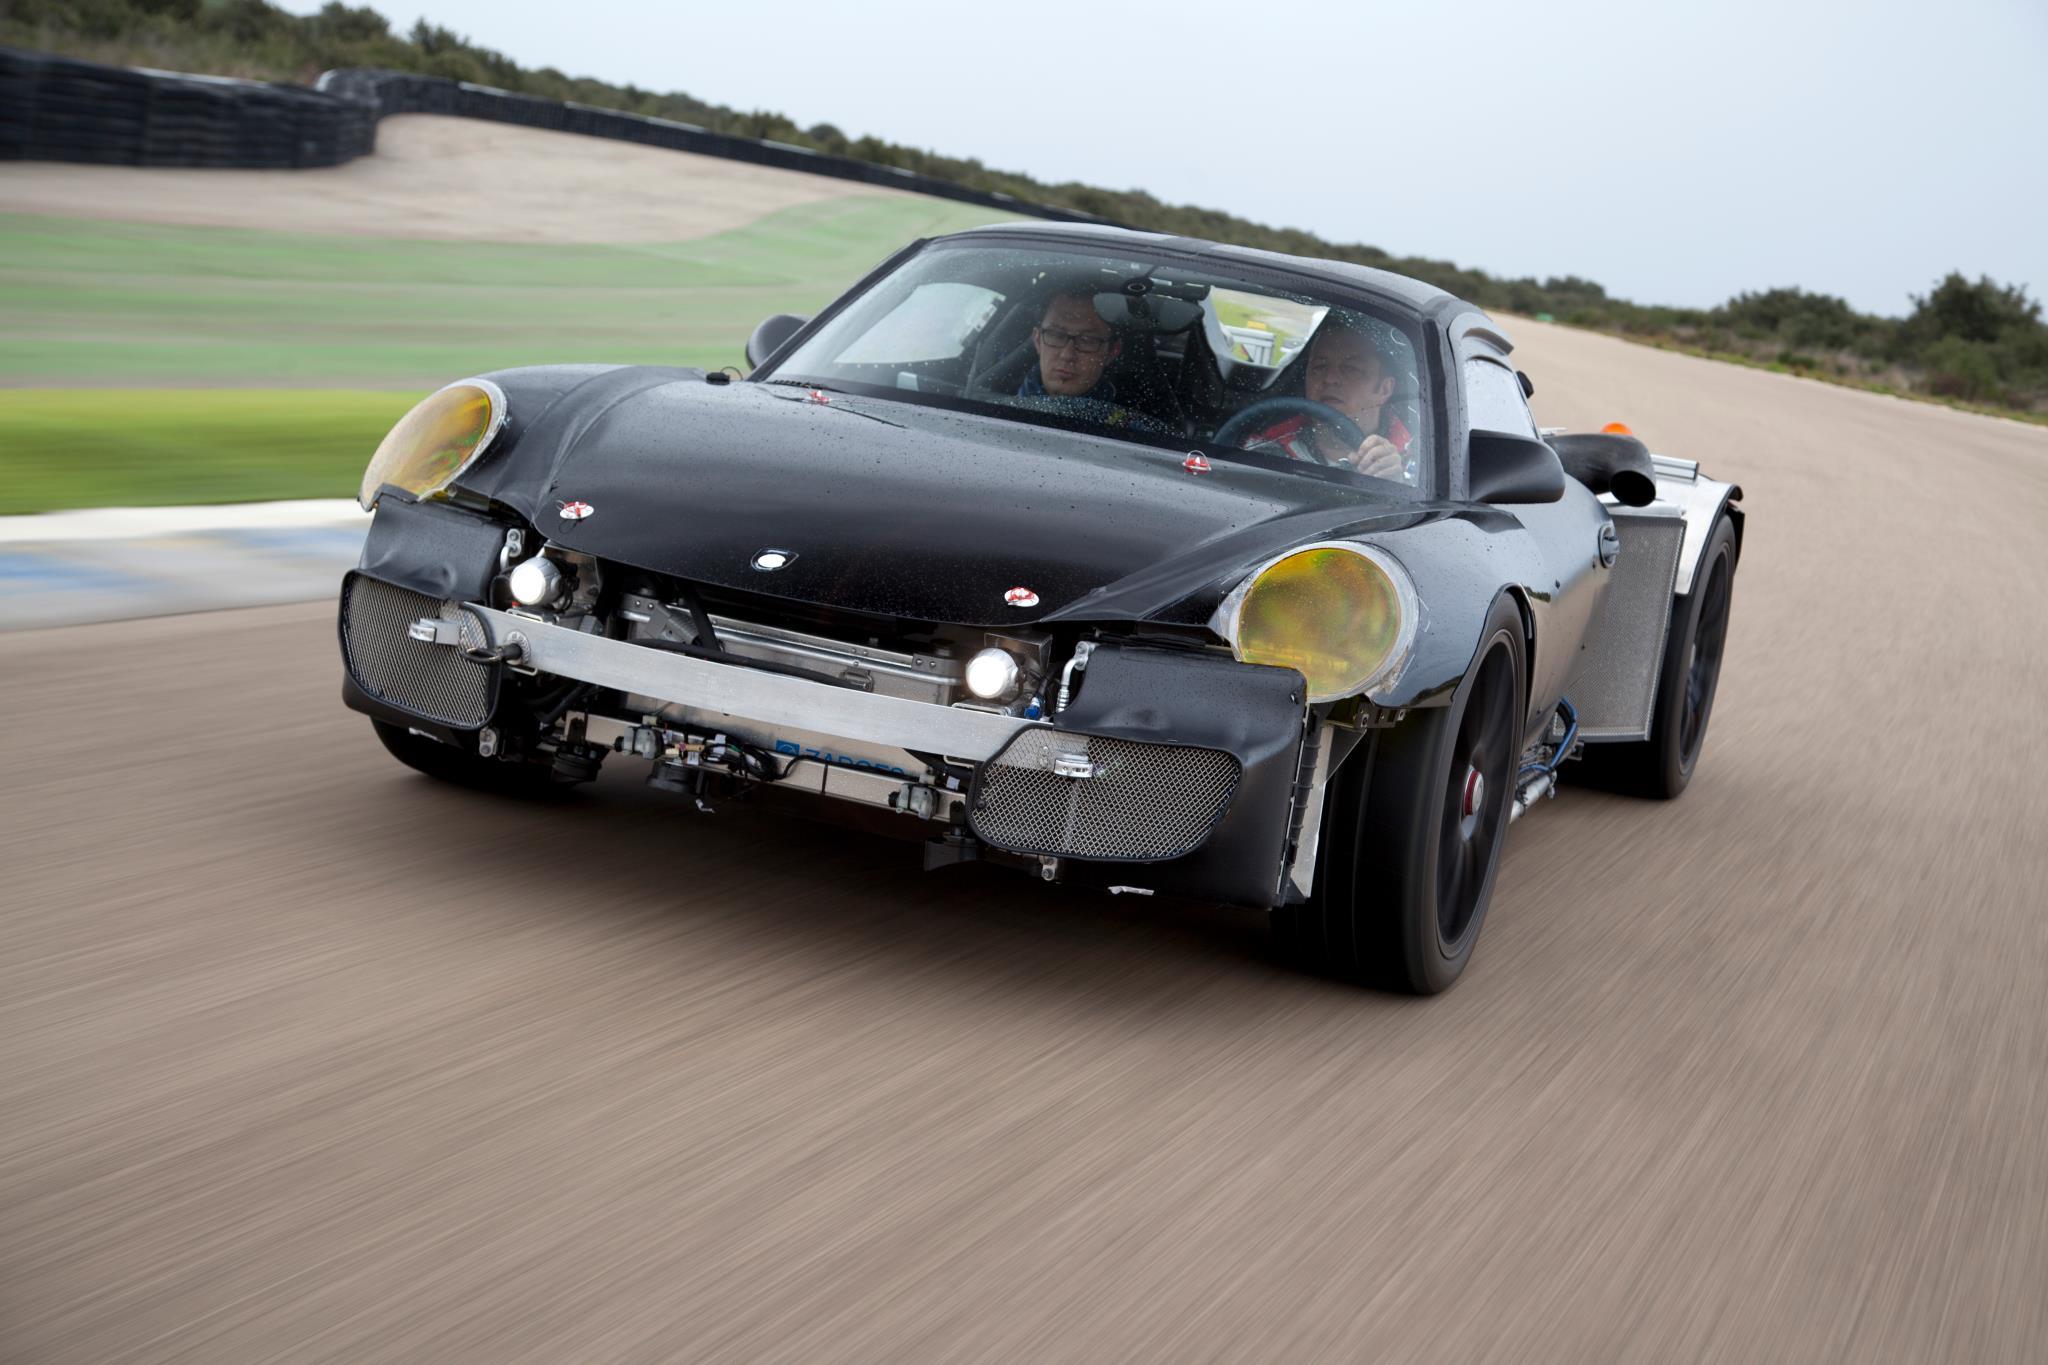 porsche 918 spyder en livr e martini racing. Black Bedroom Furniture Sets. Home Design Ideas